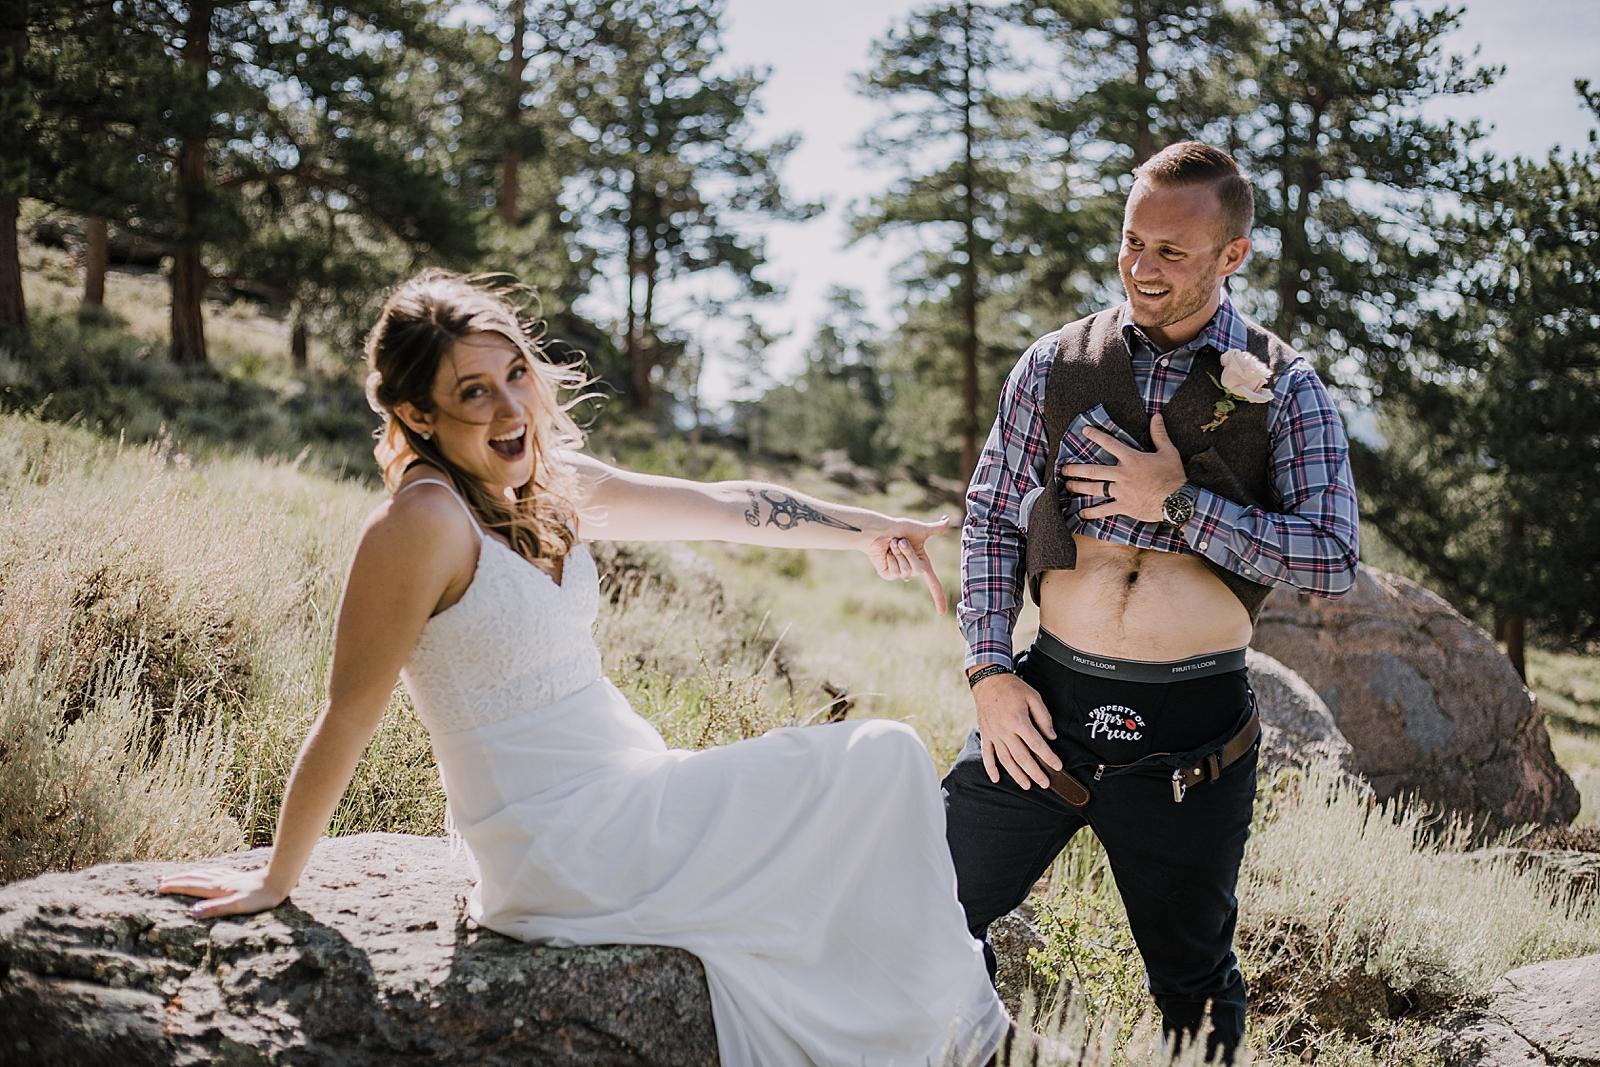 elopement underwear, RMNP elopement ceremony, rocky mountain national park elopement, 3M curves elopement, self solemnizing, self solemnization, long's peak, summer elopement, estes park elopement